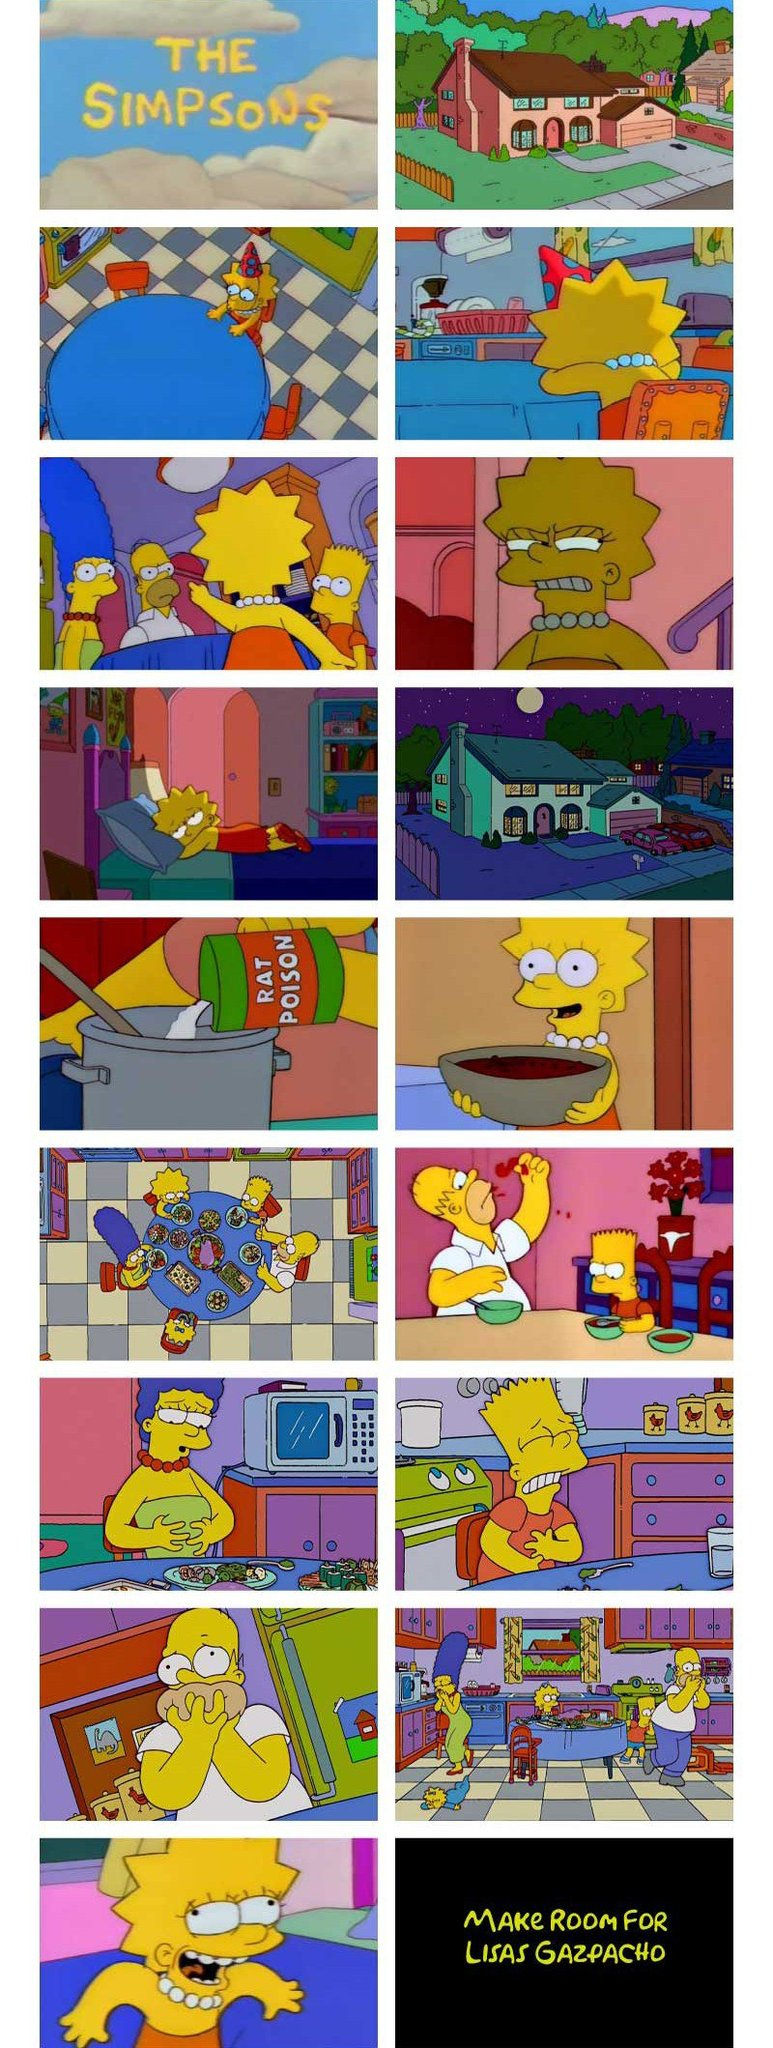 Dark Simpsons - meme